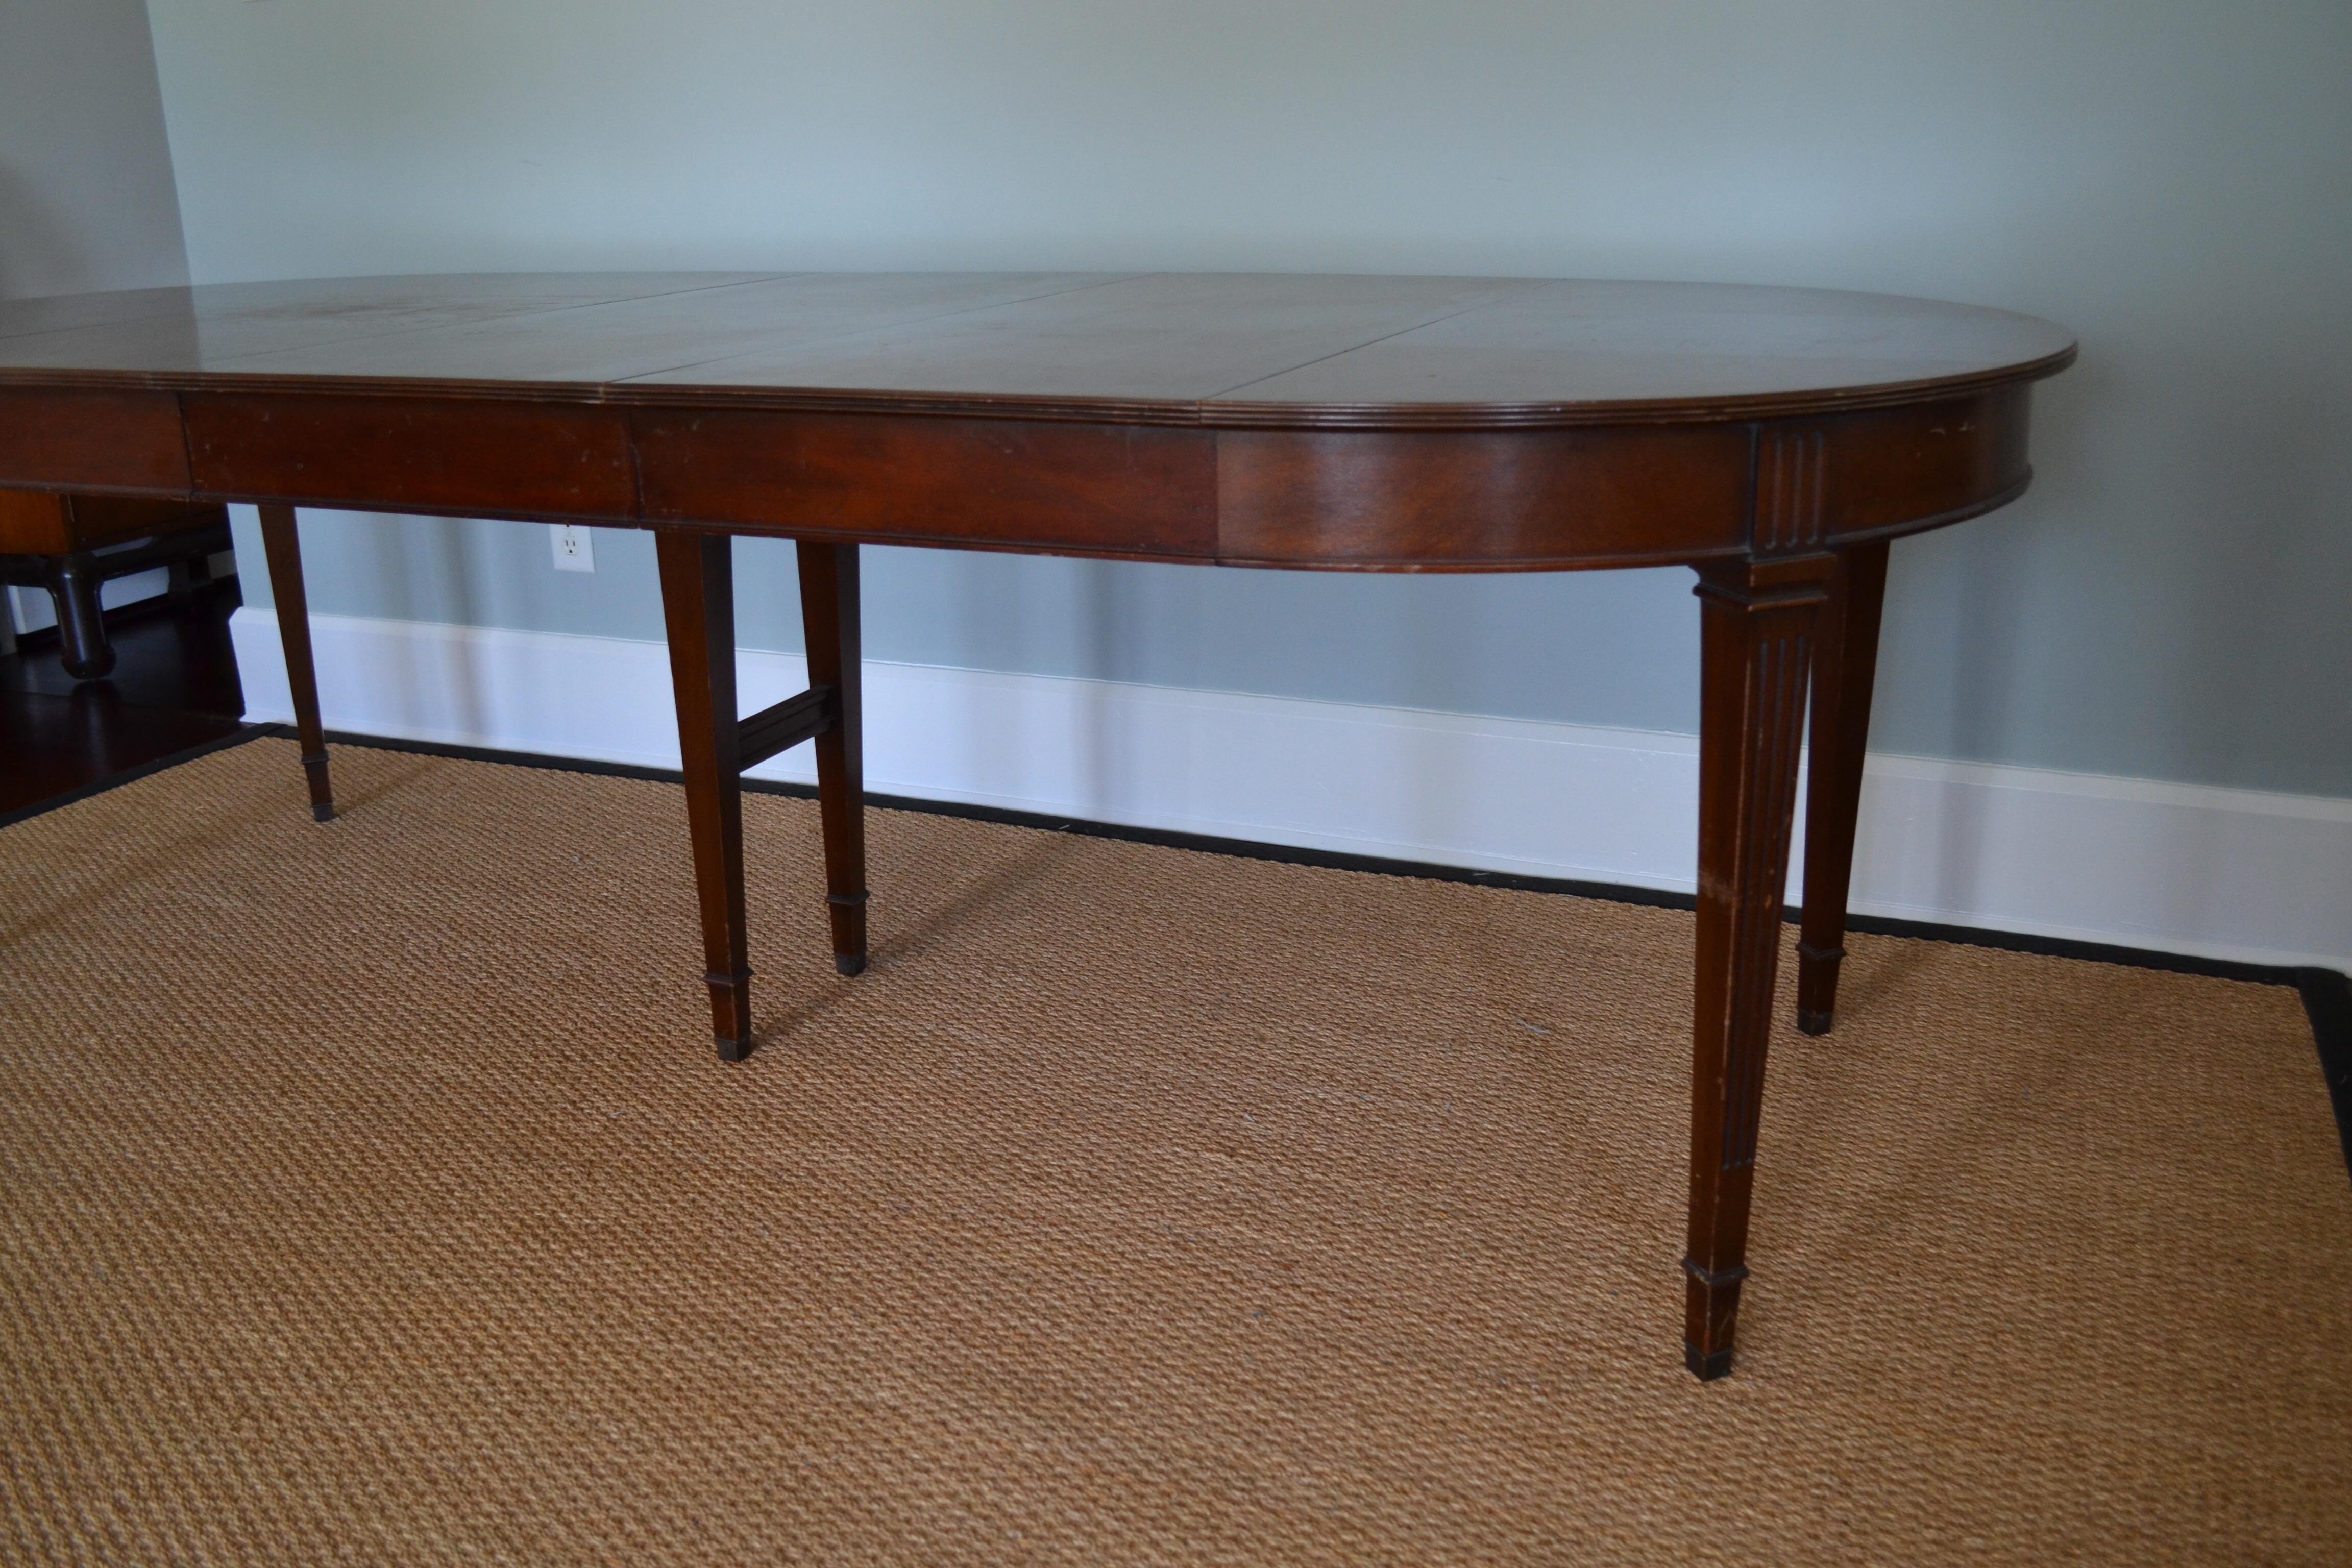 Henredon Mahogany Neoclassical Dining Table Chairish : henredon mahogany neoclassical dining table 7426aspectfitampwidth640ampheight640 from www.chairish.com size 640 x 640 jpeg 44kB